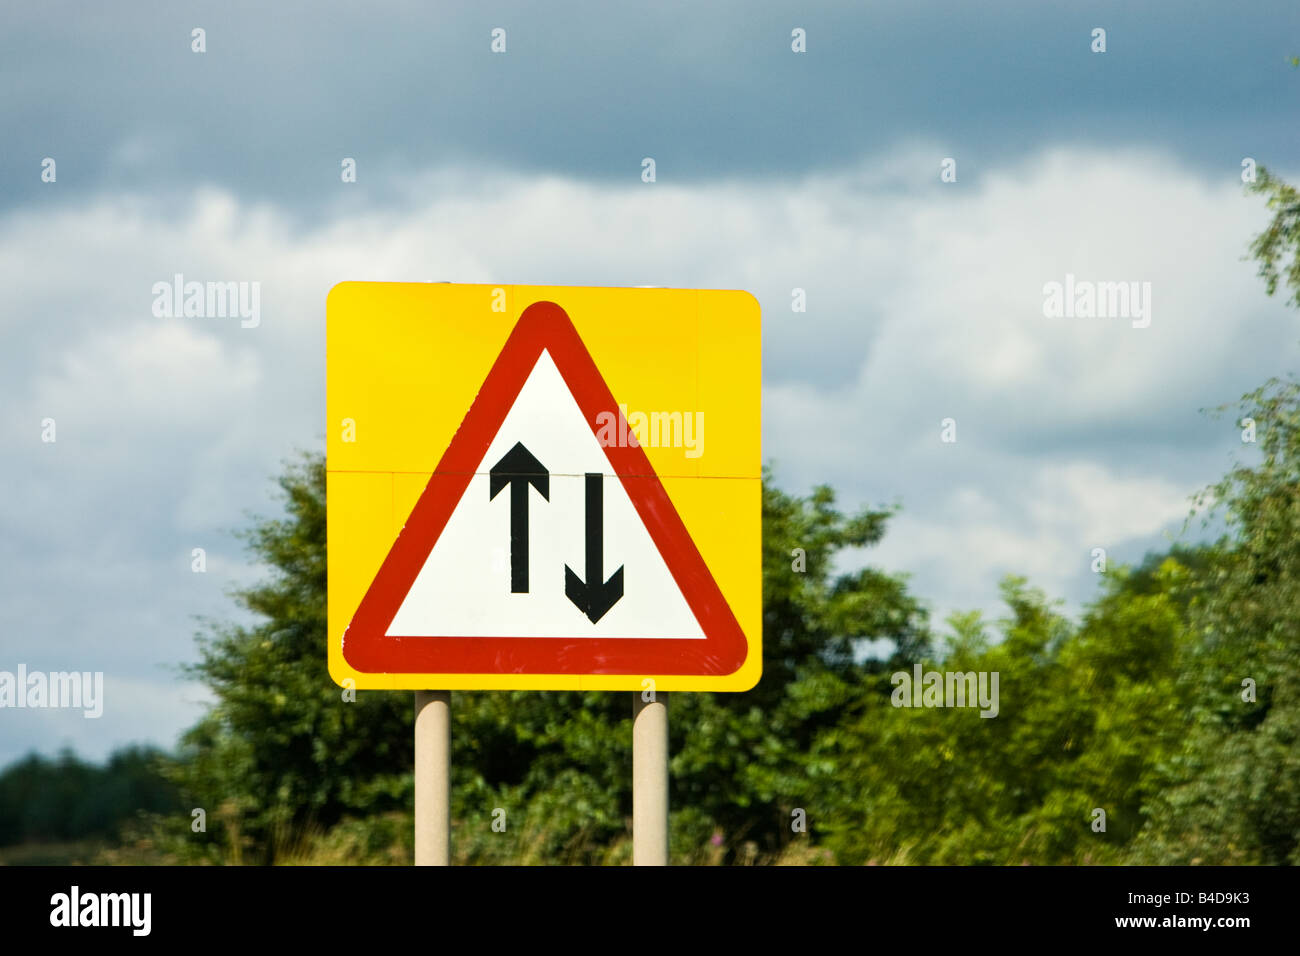 Warning Signs : Two-Way Traffic Ahead |Two Way Traffic Ahead Sign